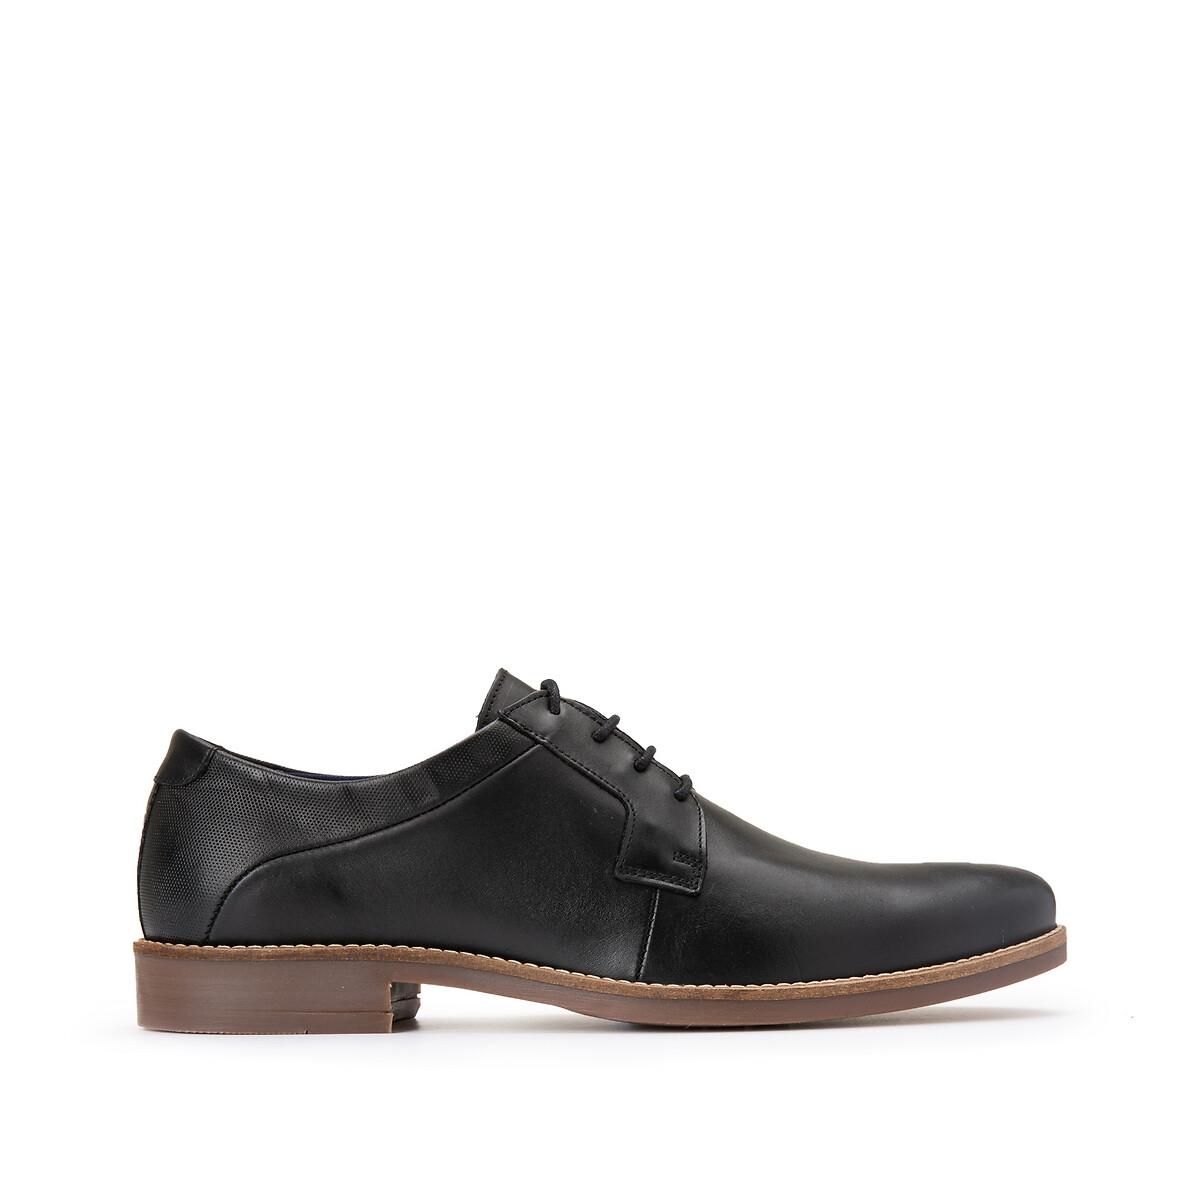 Ботинки-дерби La Redoute Кожаные 41 черный ботинки дерби la redoute кожаные divyo 39 оранжевый